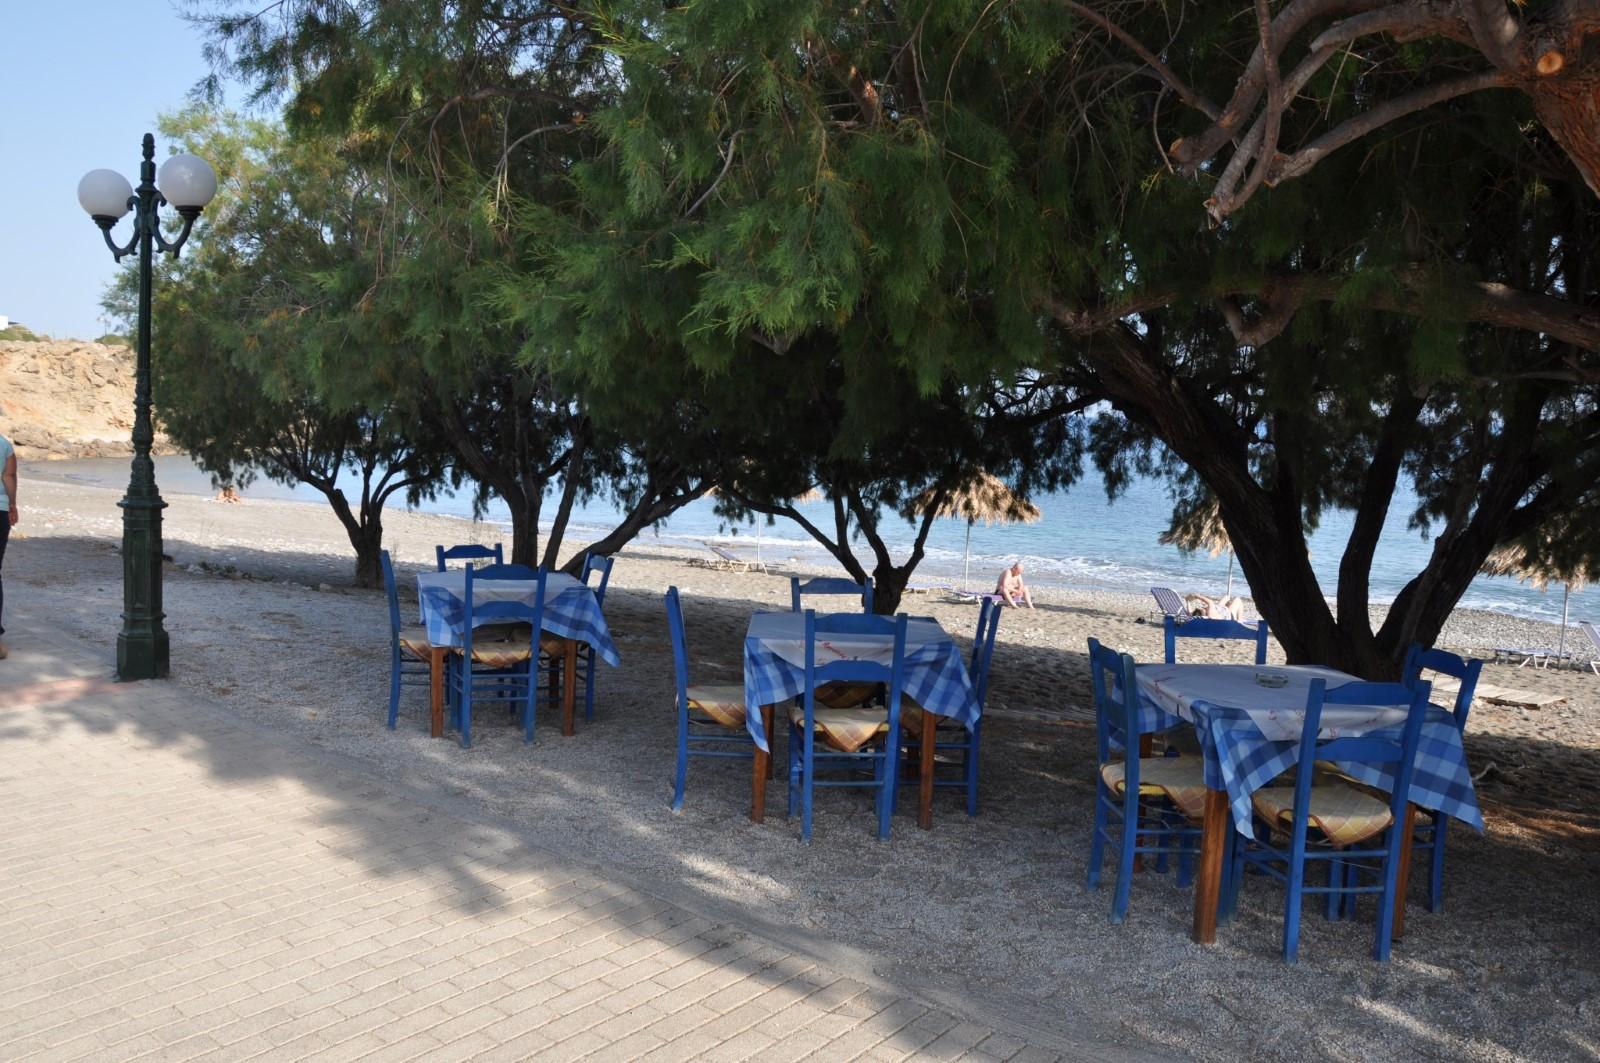 Taverne direkt am Strand